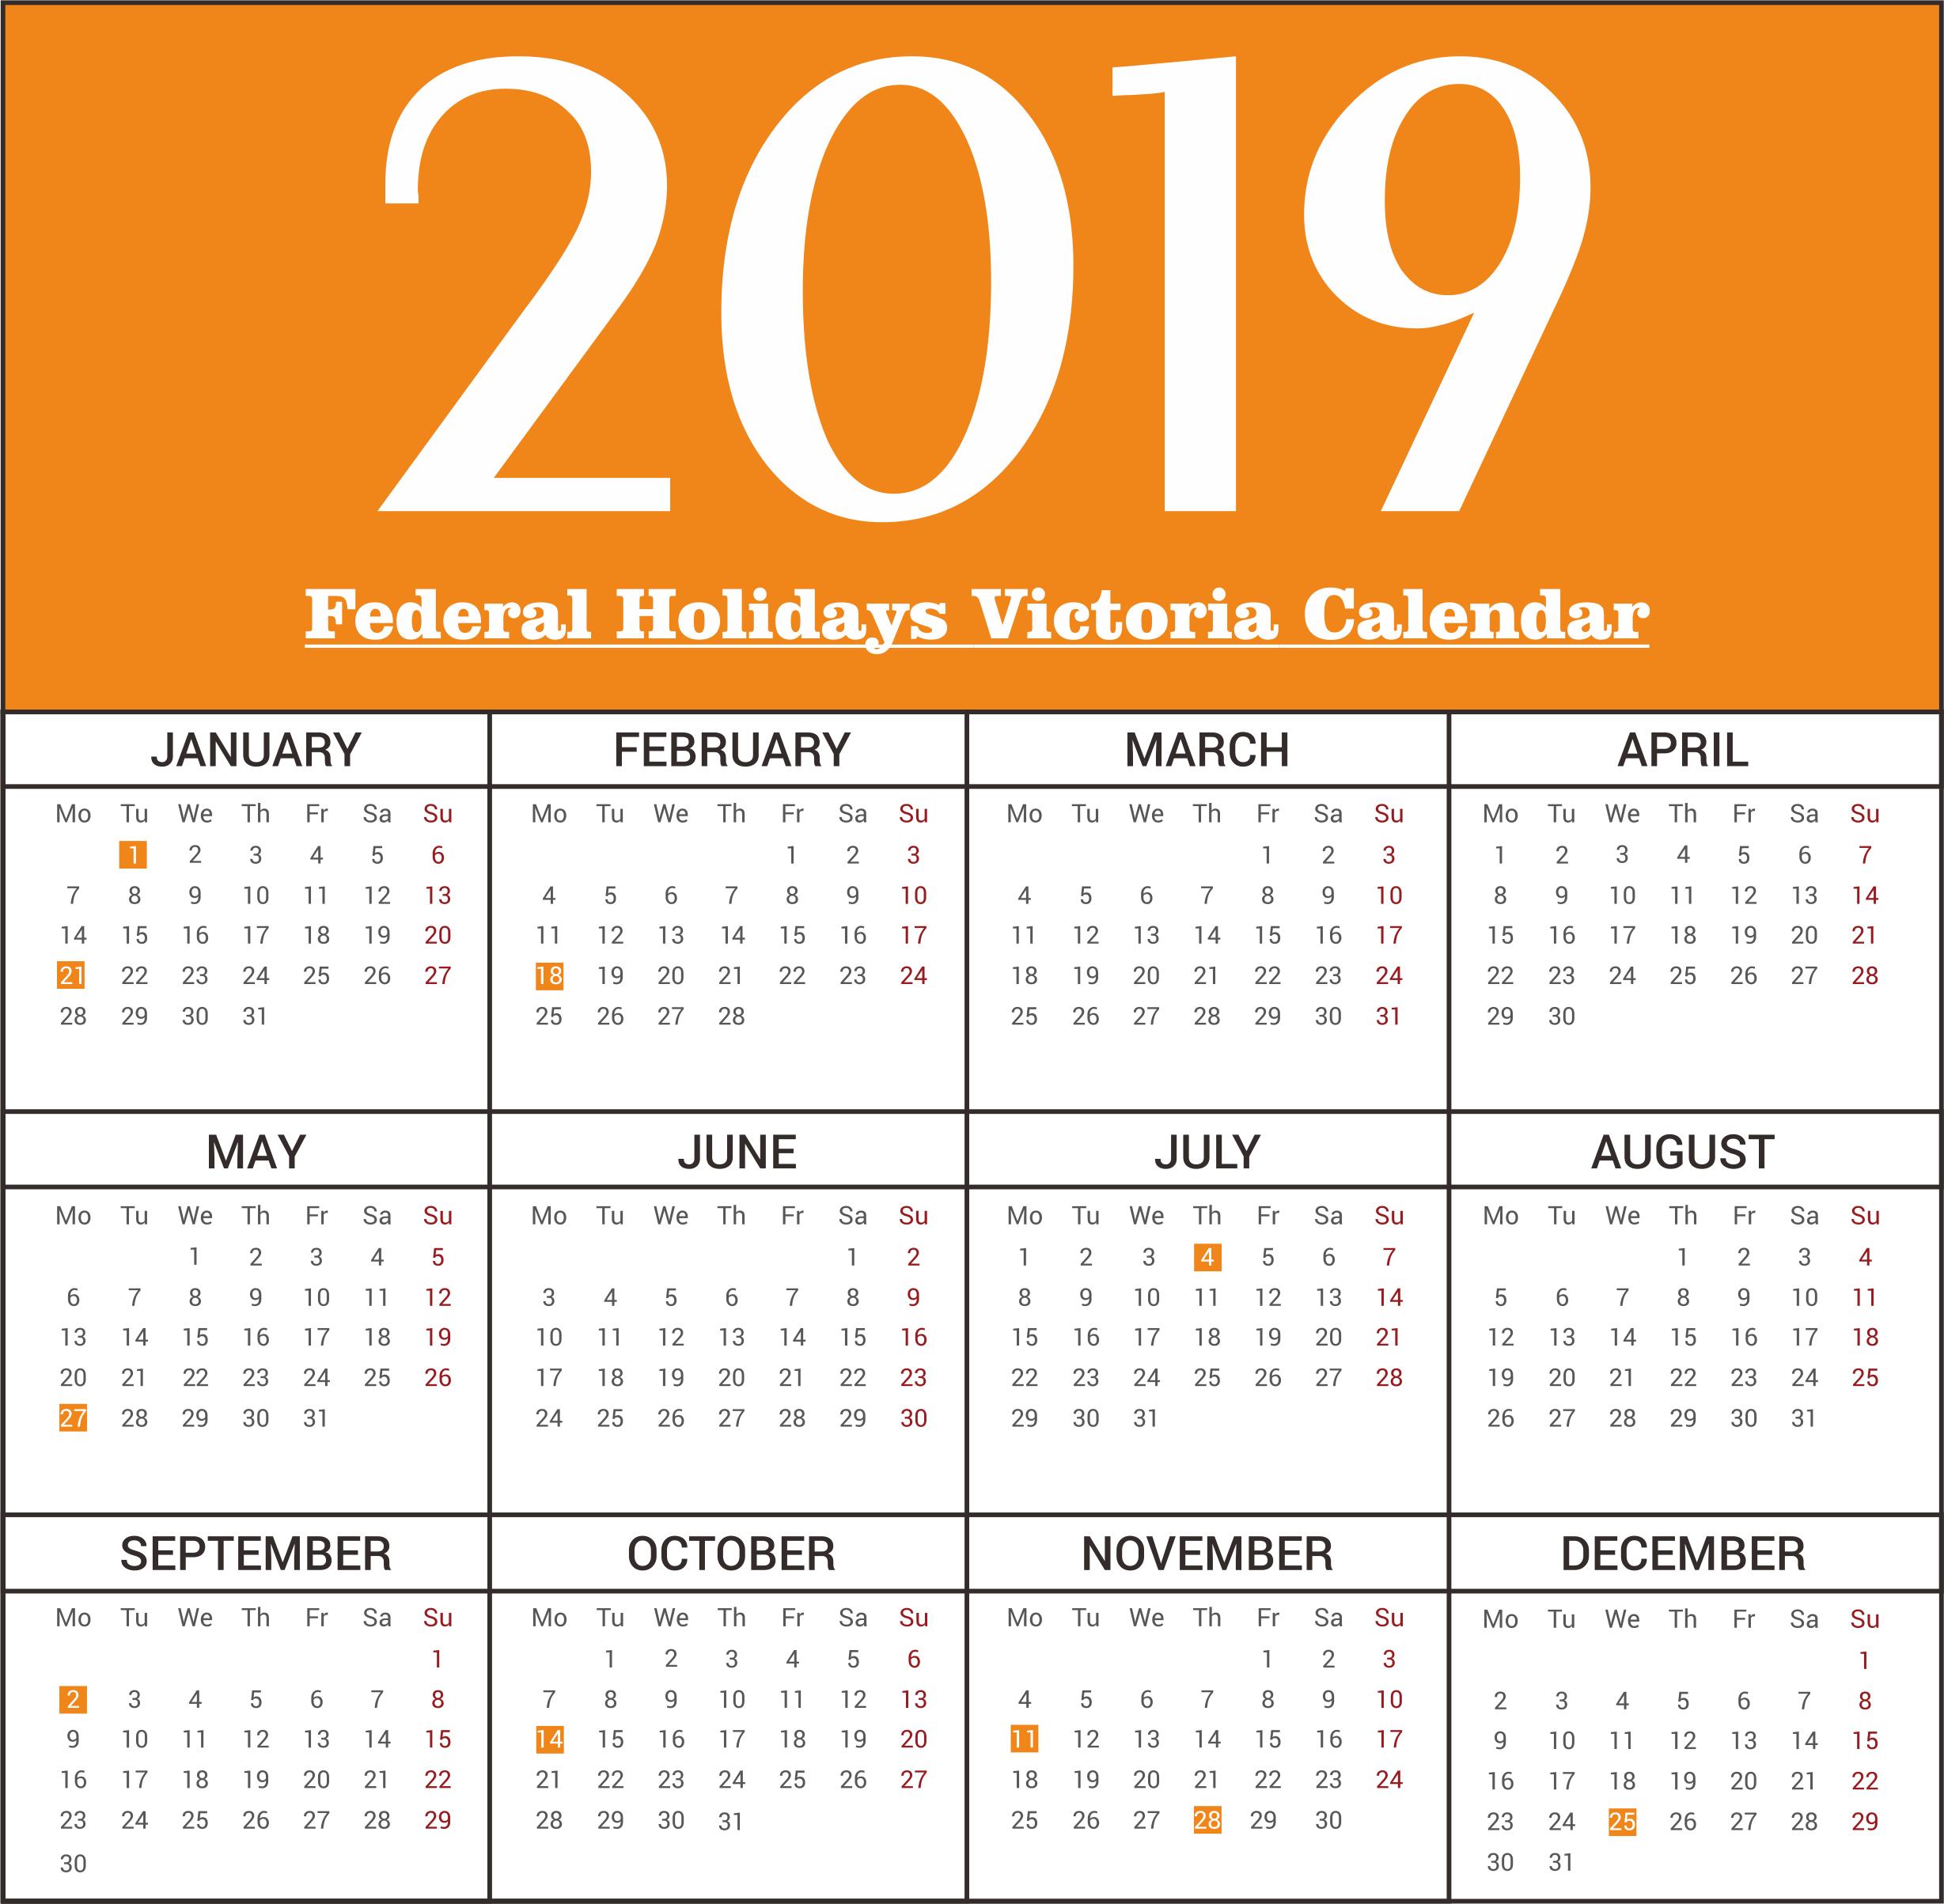 Free Victoria Federal Holidays 2019 Calendar Templates   Free Calendar 2019 Victoria